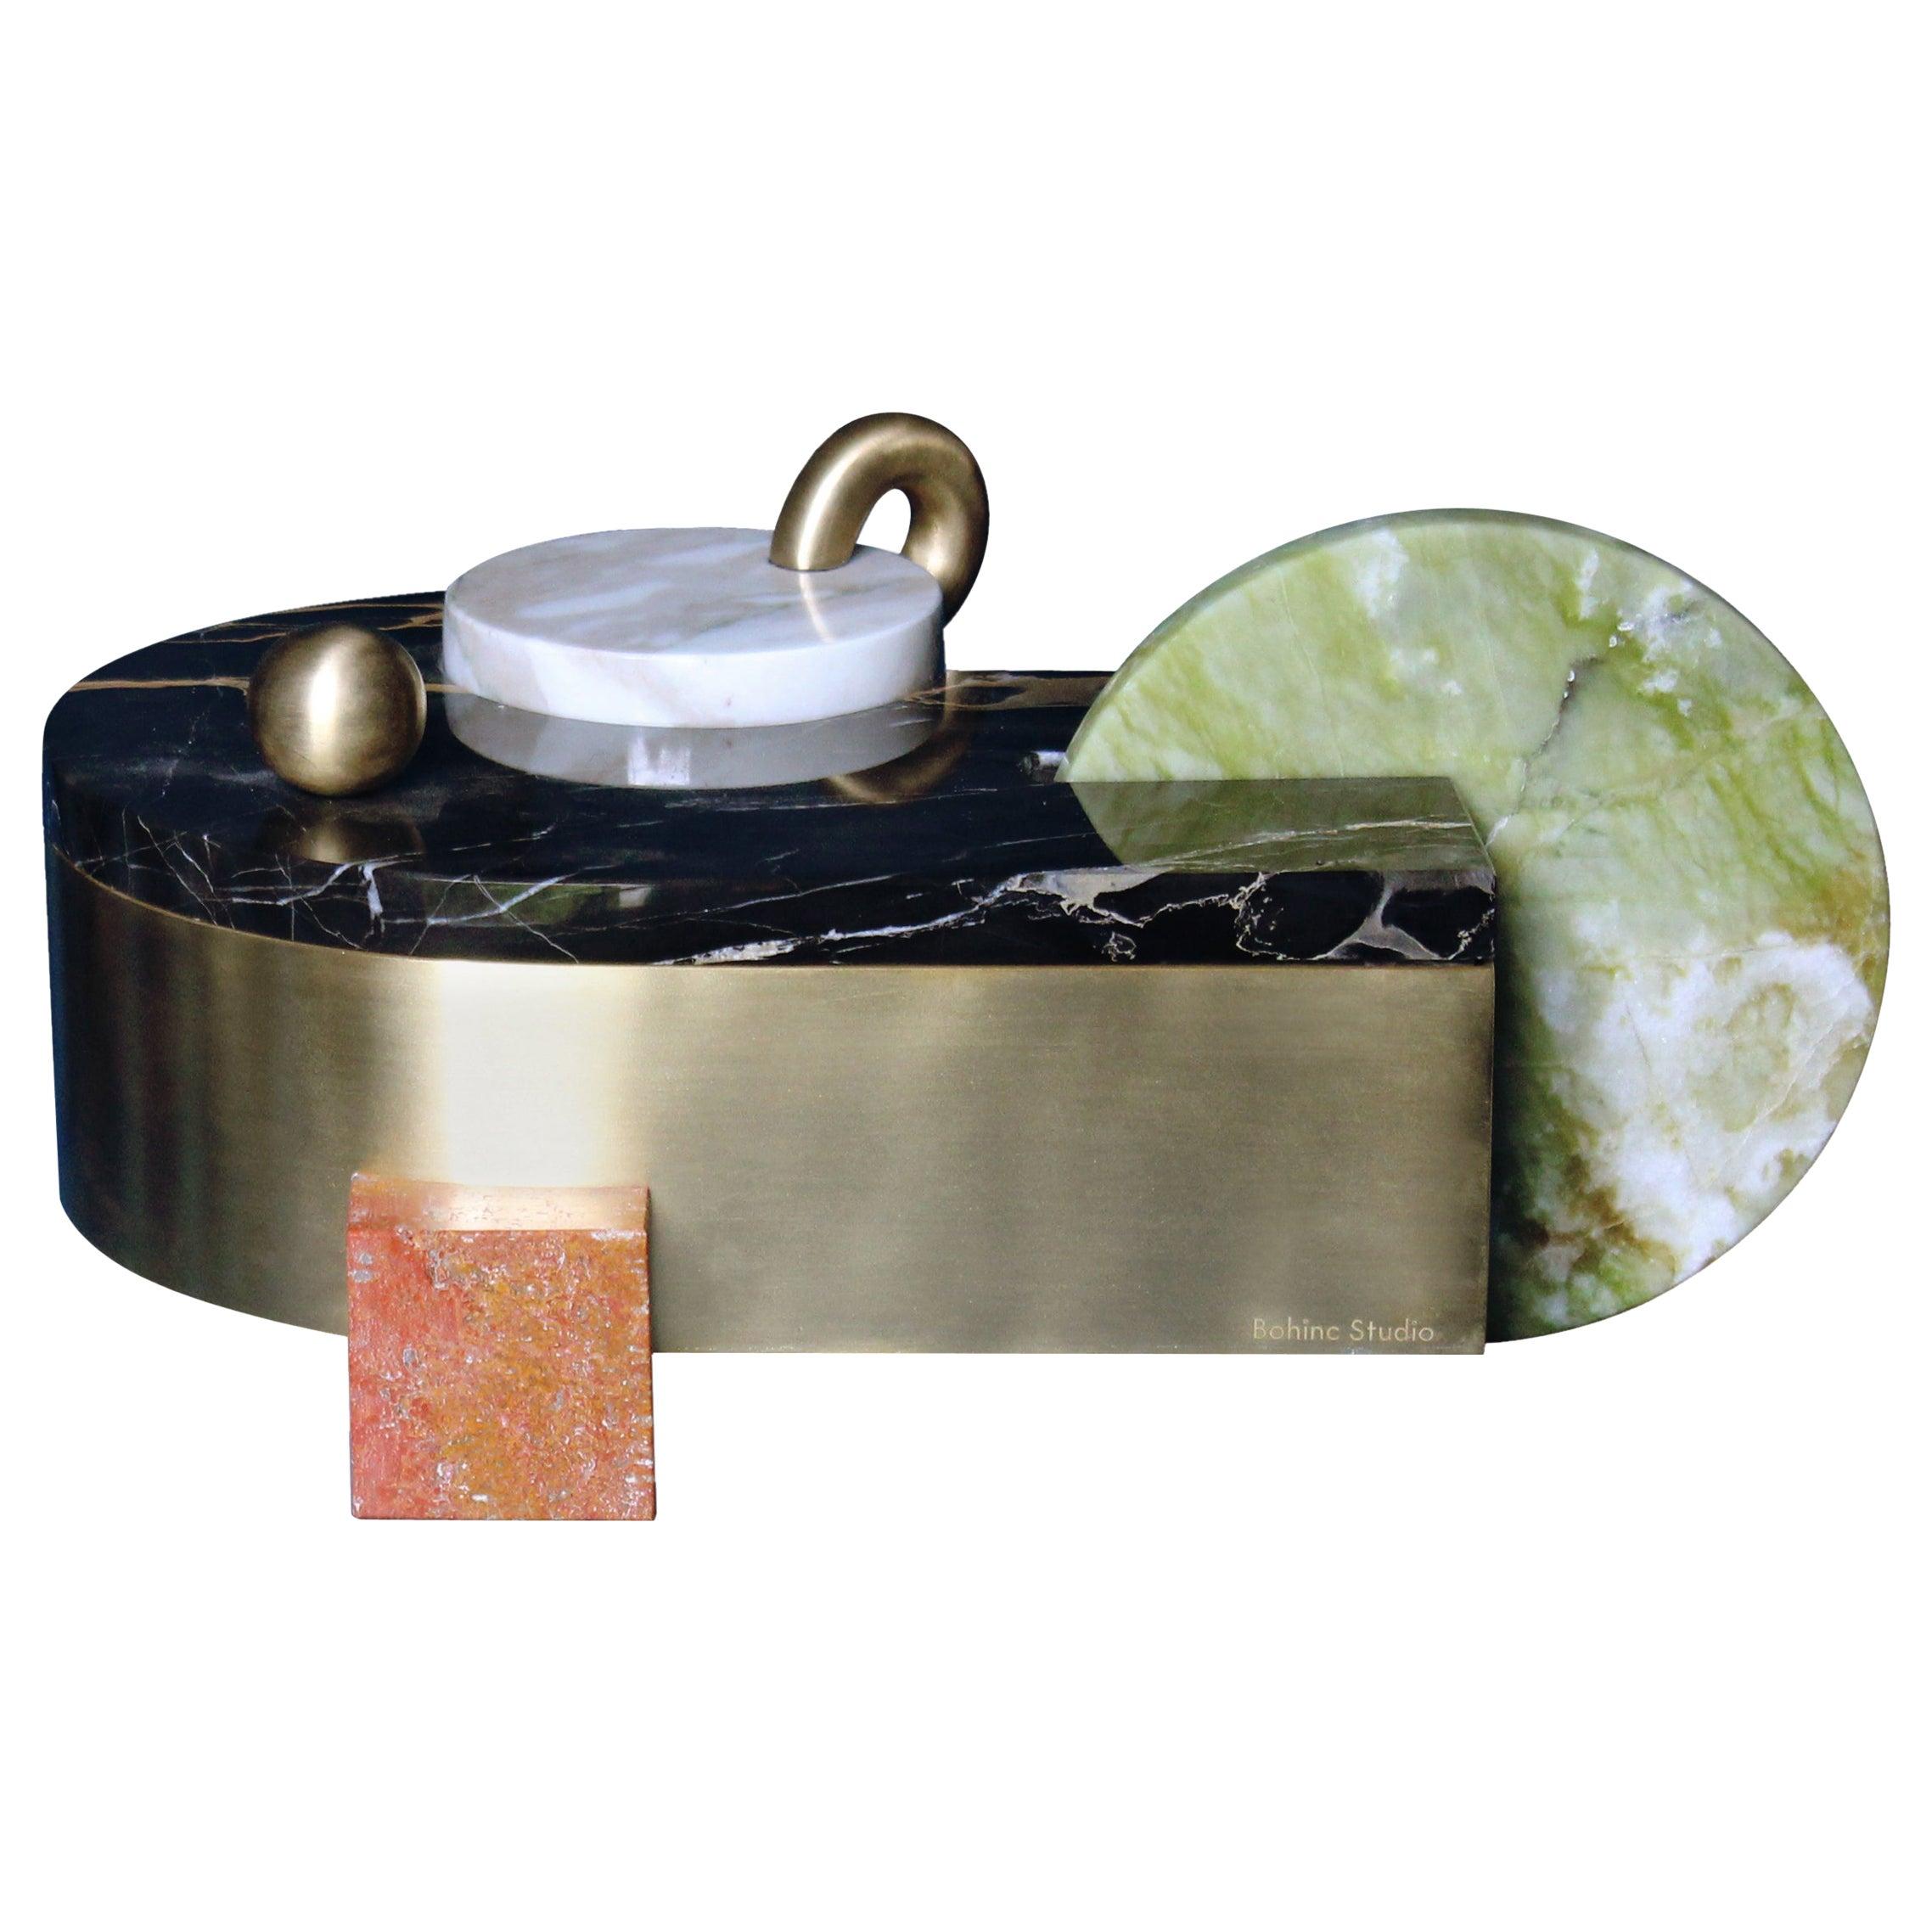 Juno Box, Marble and Brass, by Bohinc Studio